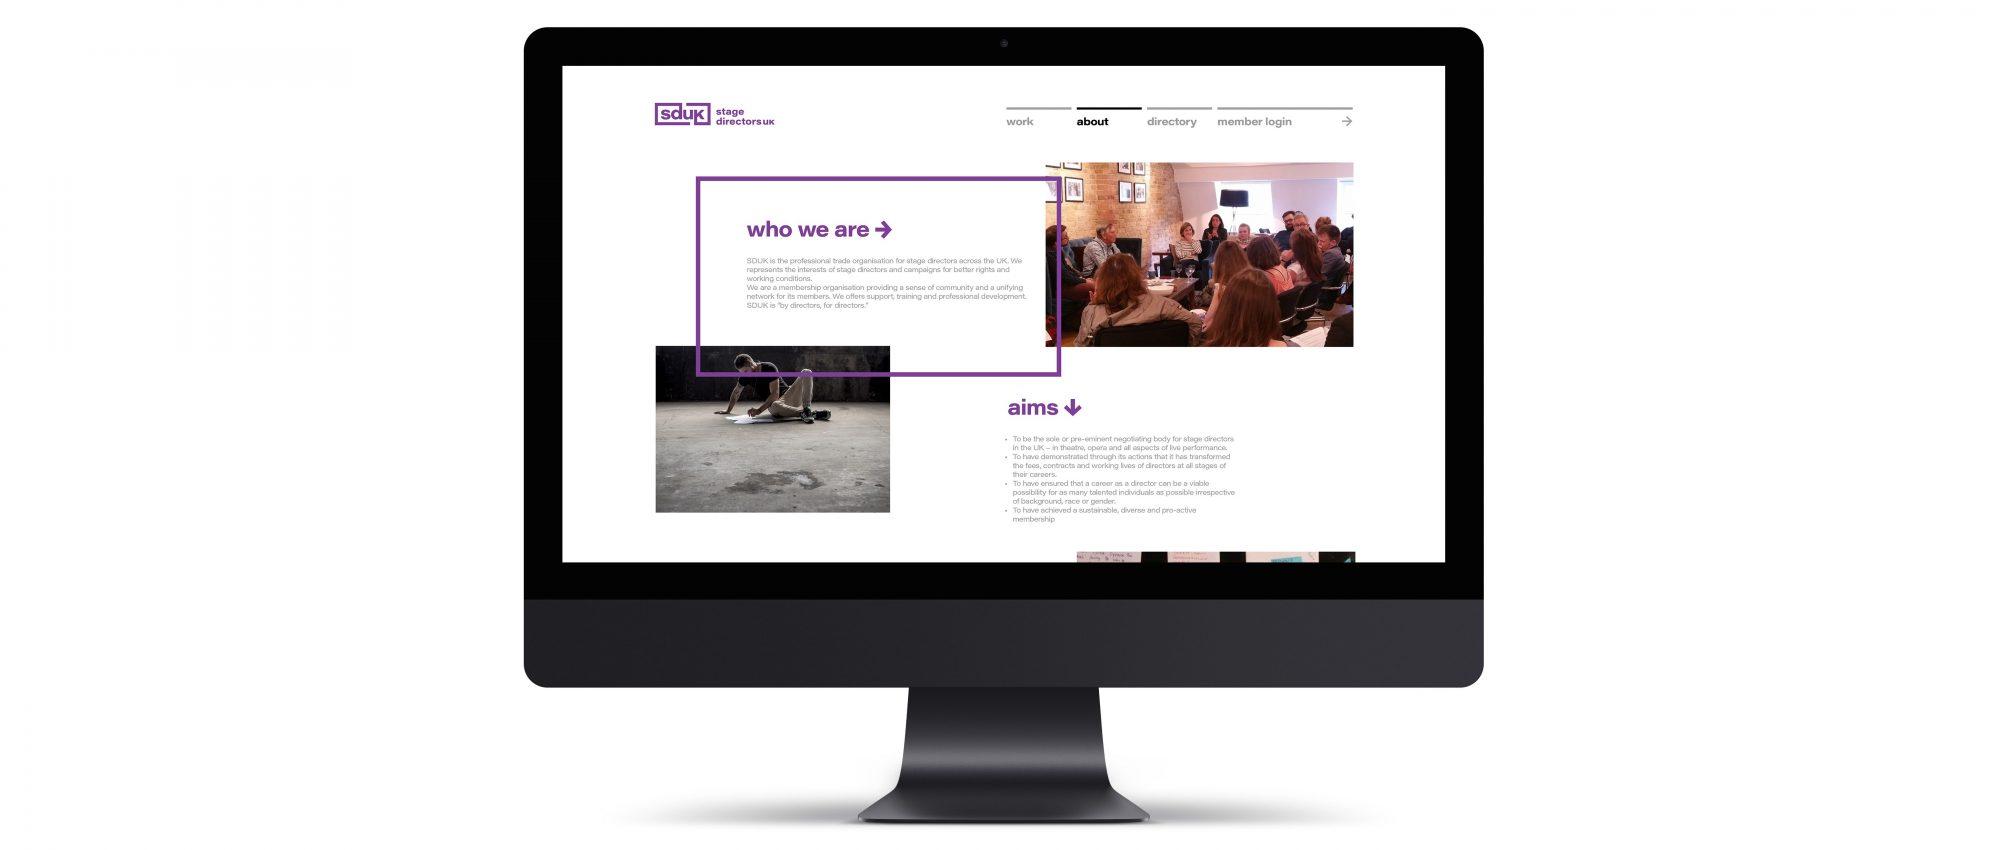 homepage design on desktop monitor